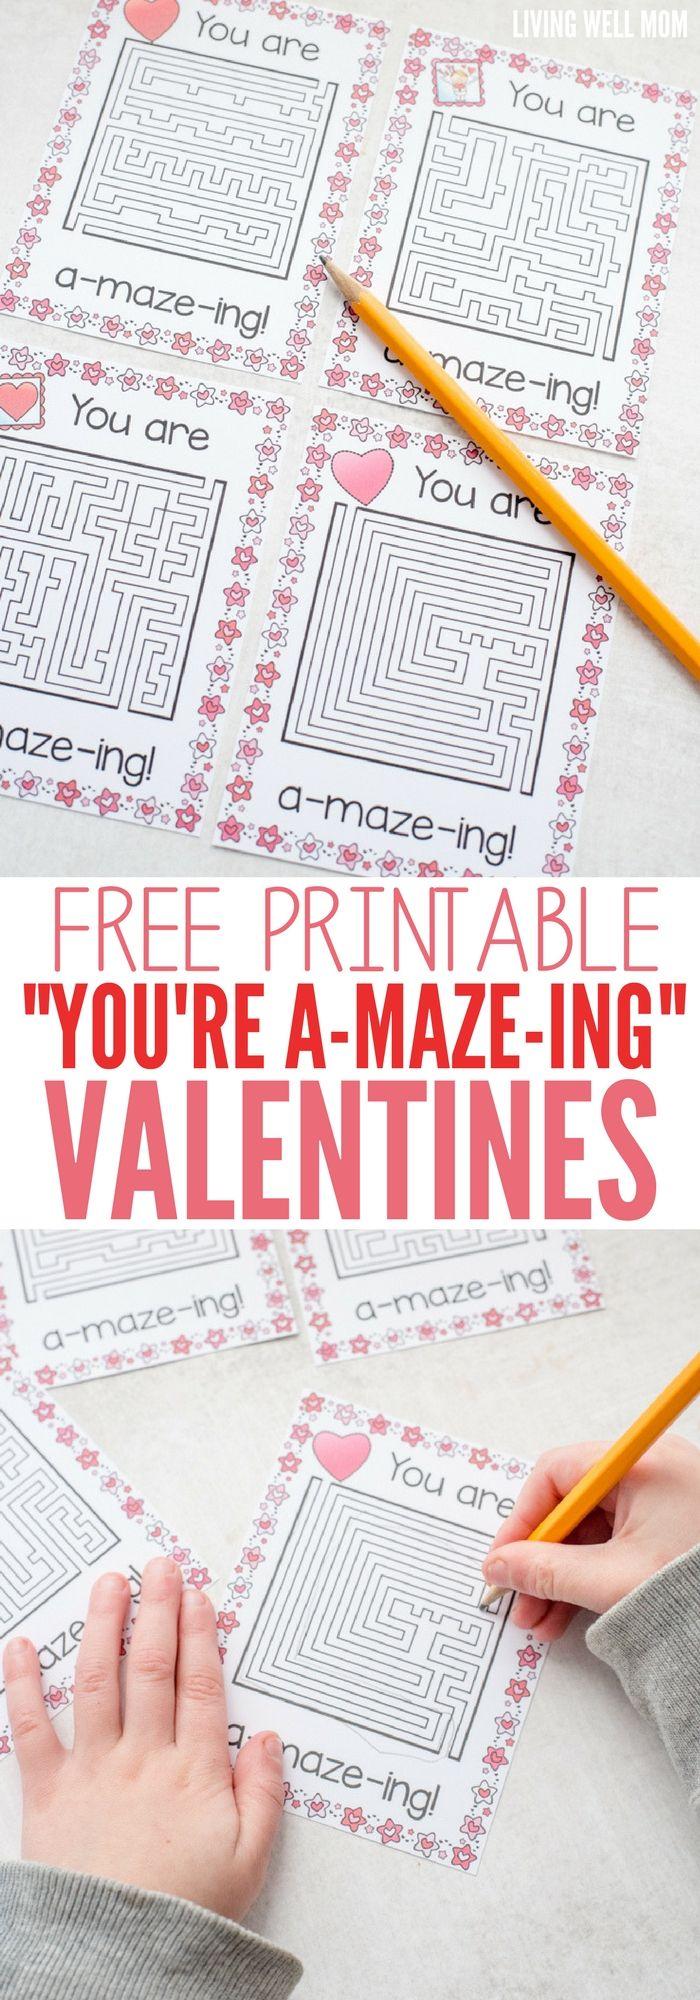 442 best VALENTINES DAY IDEAS images on Pinterest   Kitchens, Petit ...